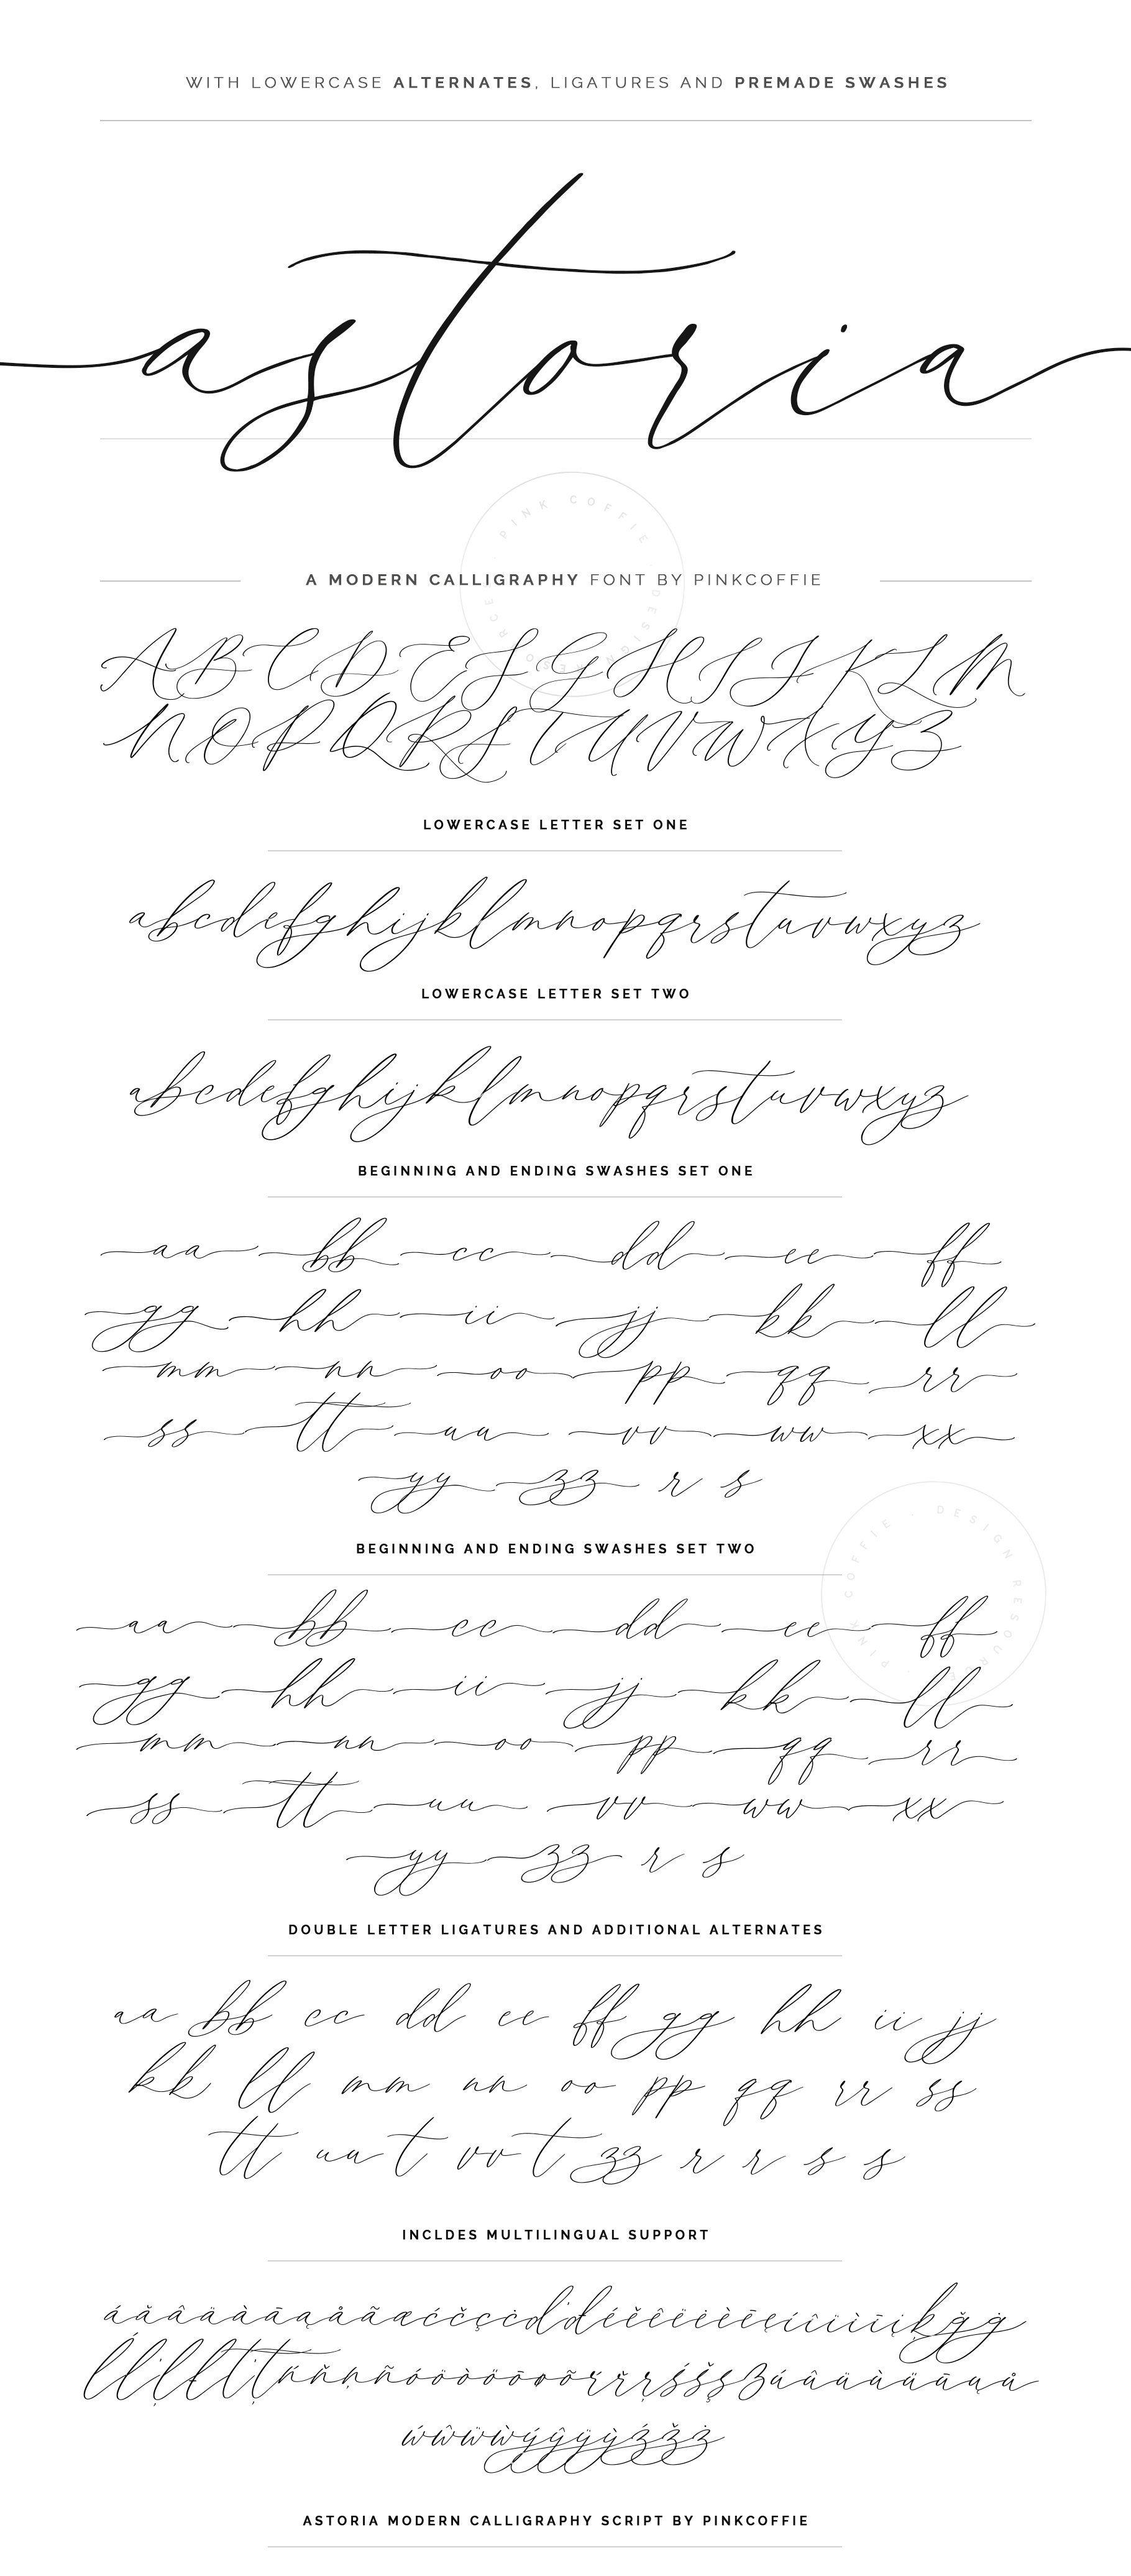 Astoria Modern Calligraphy Script